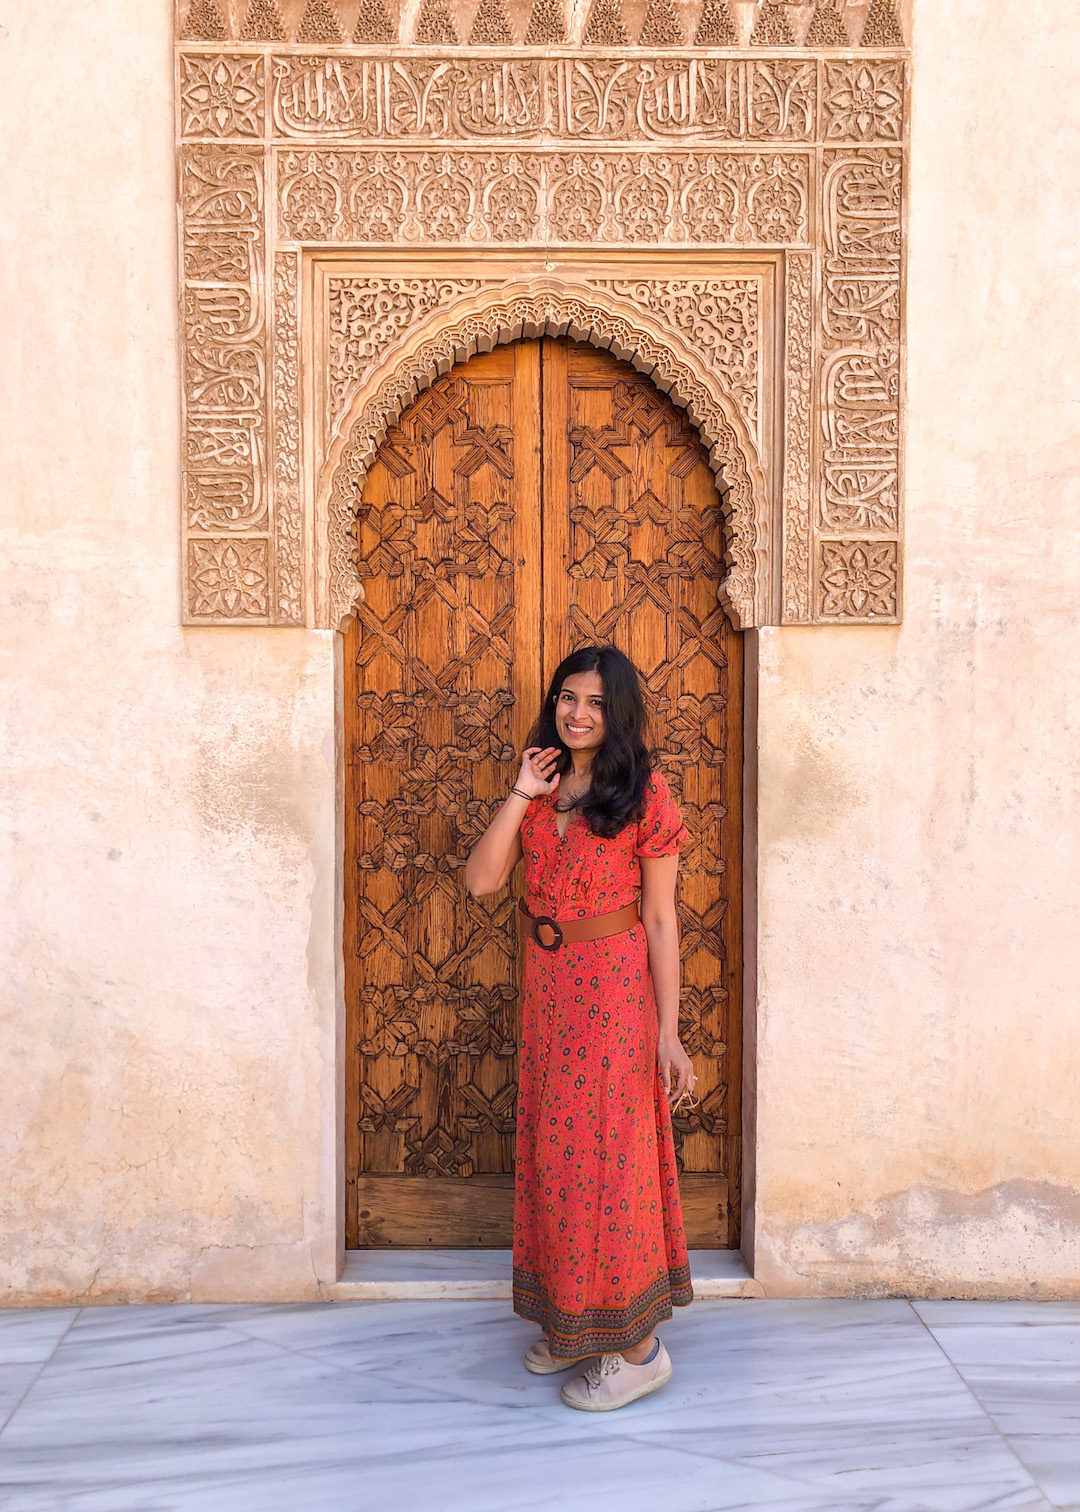 Her_Travel_Edit_Granada_Alhambra_Nasrid_Palace